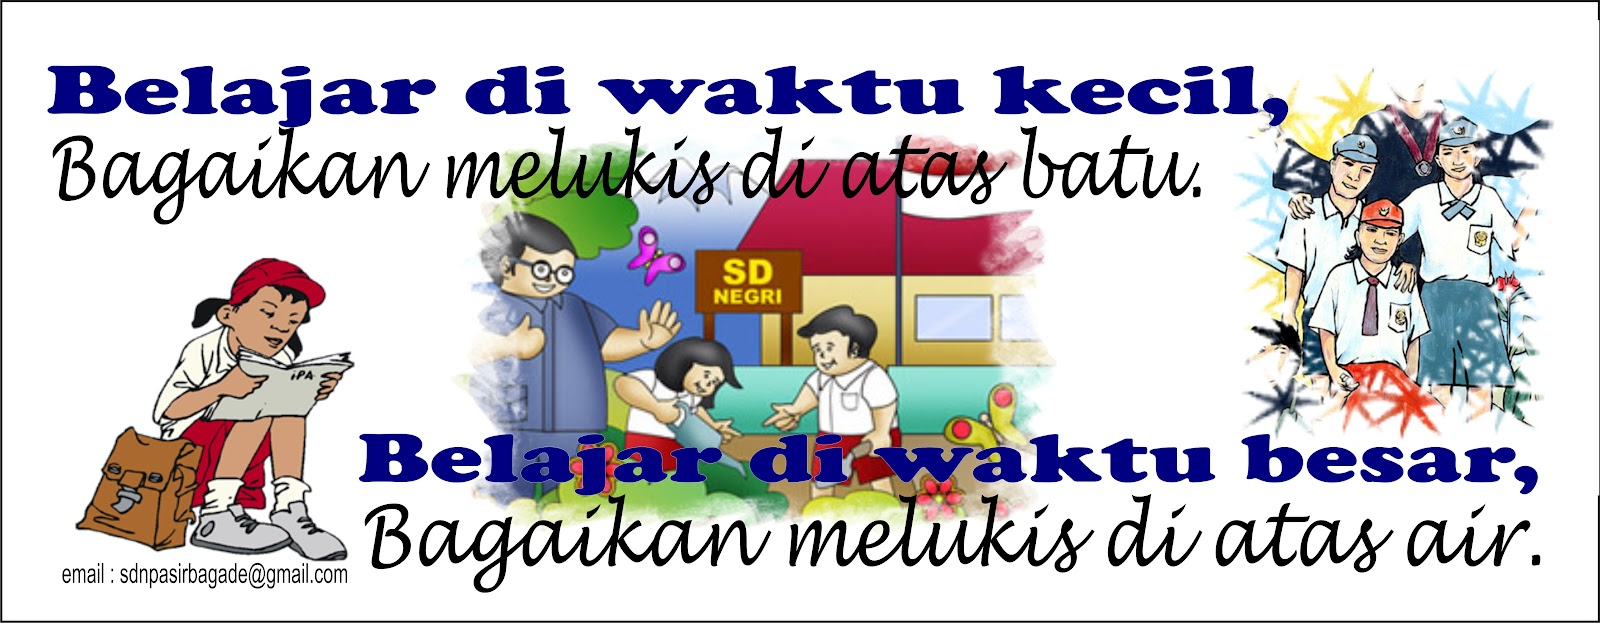 Contoh Gambar Slogan Slogan Pendidikan Contoh Poster Slogan Pendidikan Lingkungan Kesehatan Contoh Slogan Pendidikan Sekolah Aktual Post